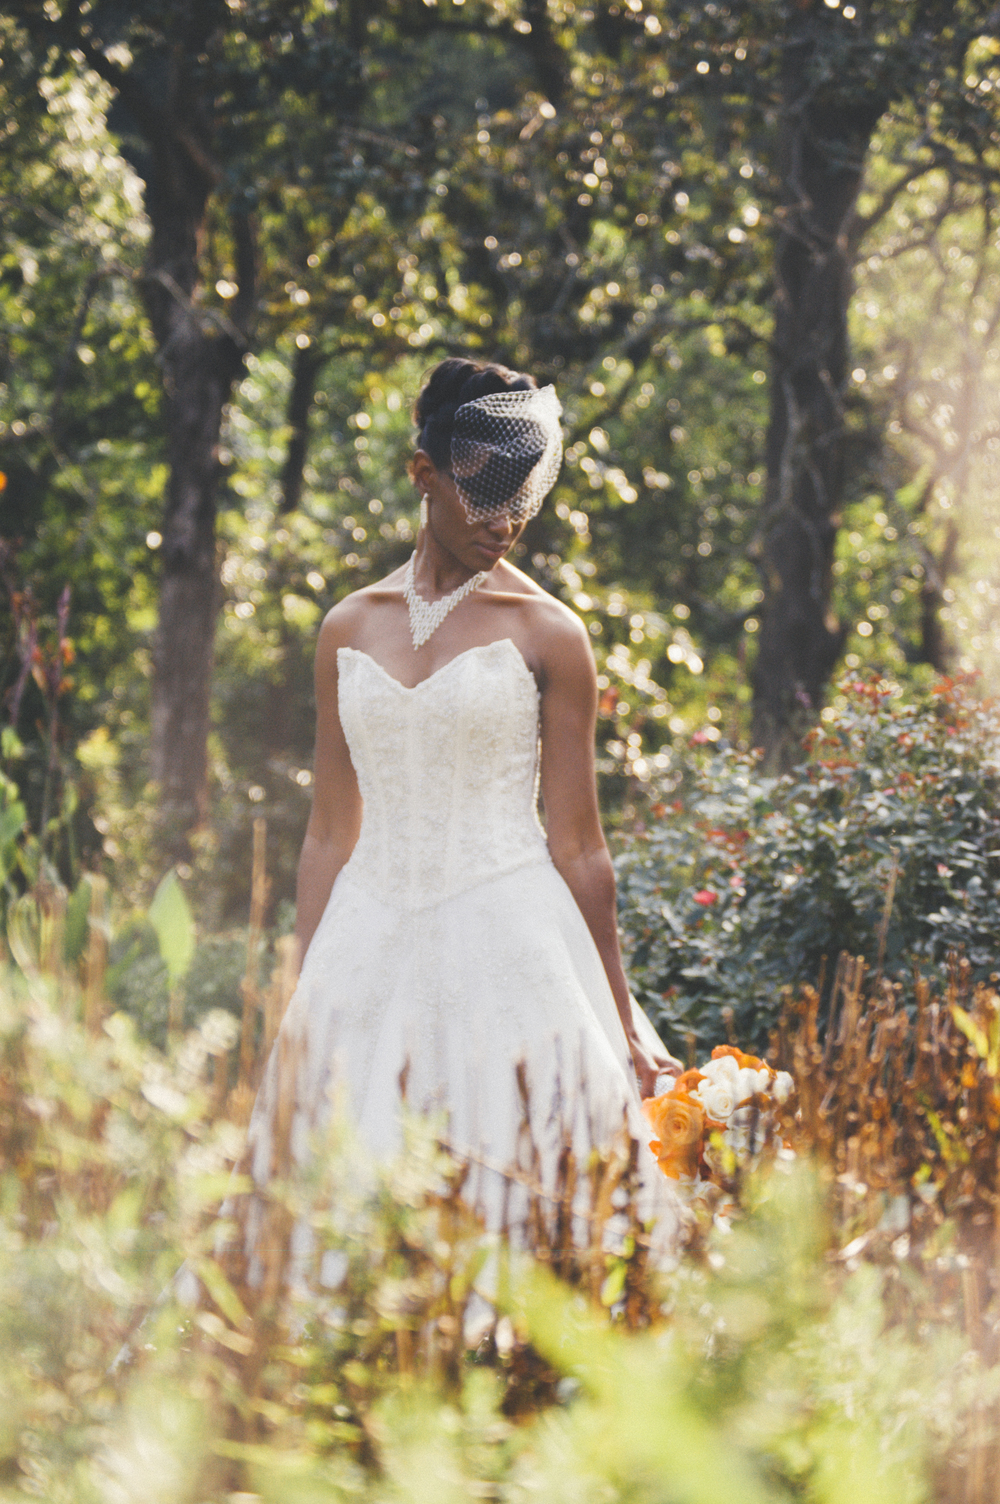 albrica_tierra_atlanta_wedding_photographer_photography_07.jpg